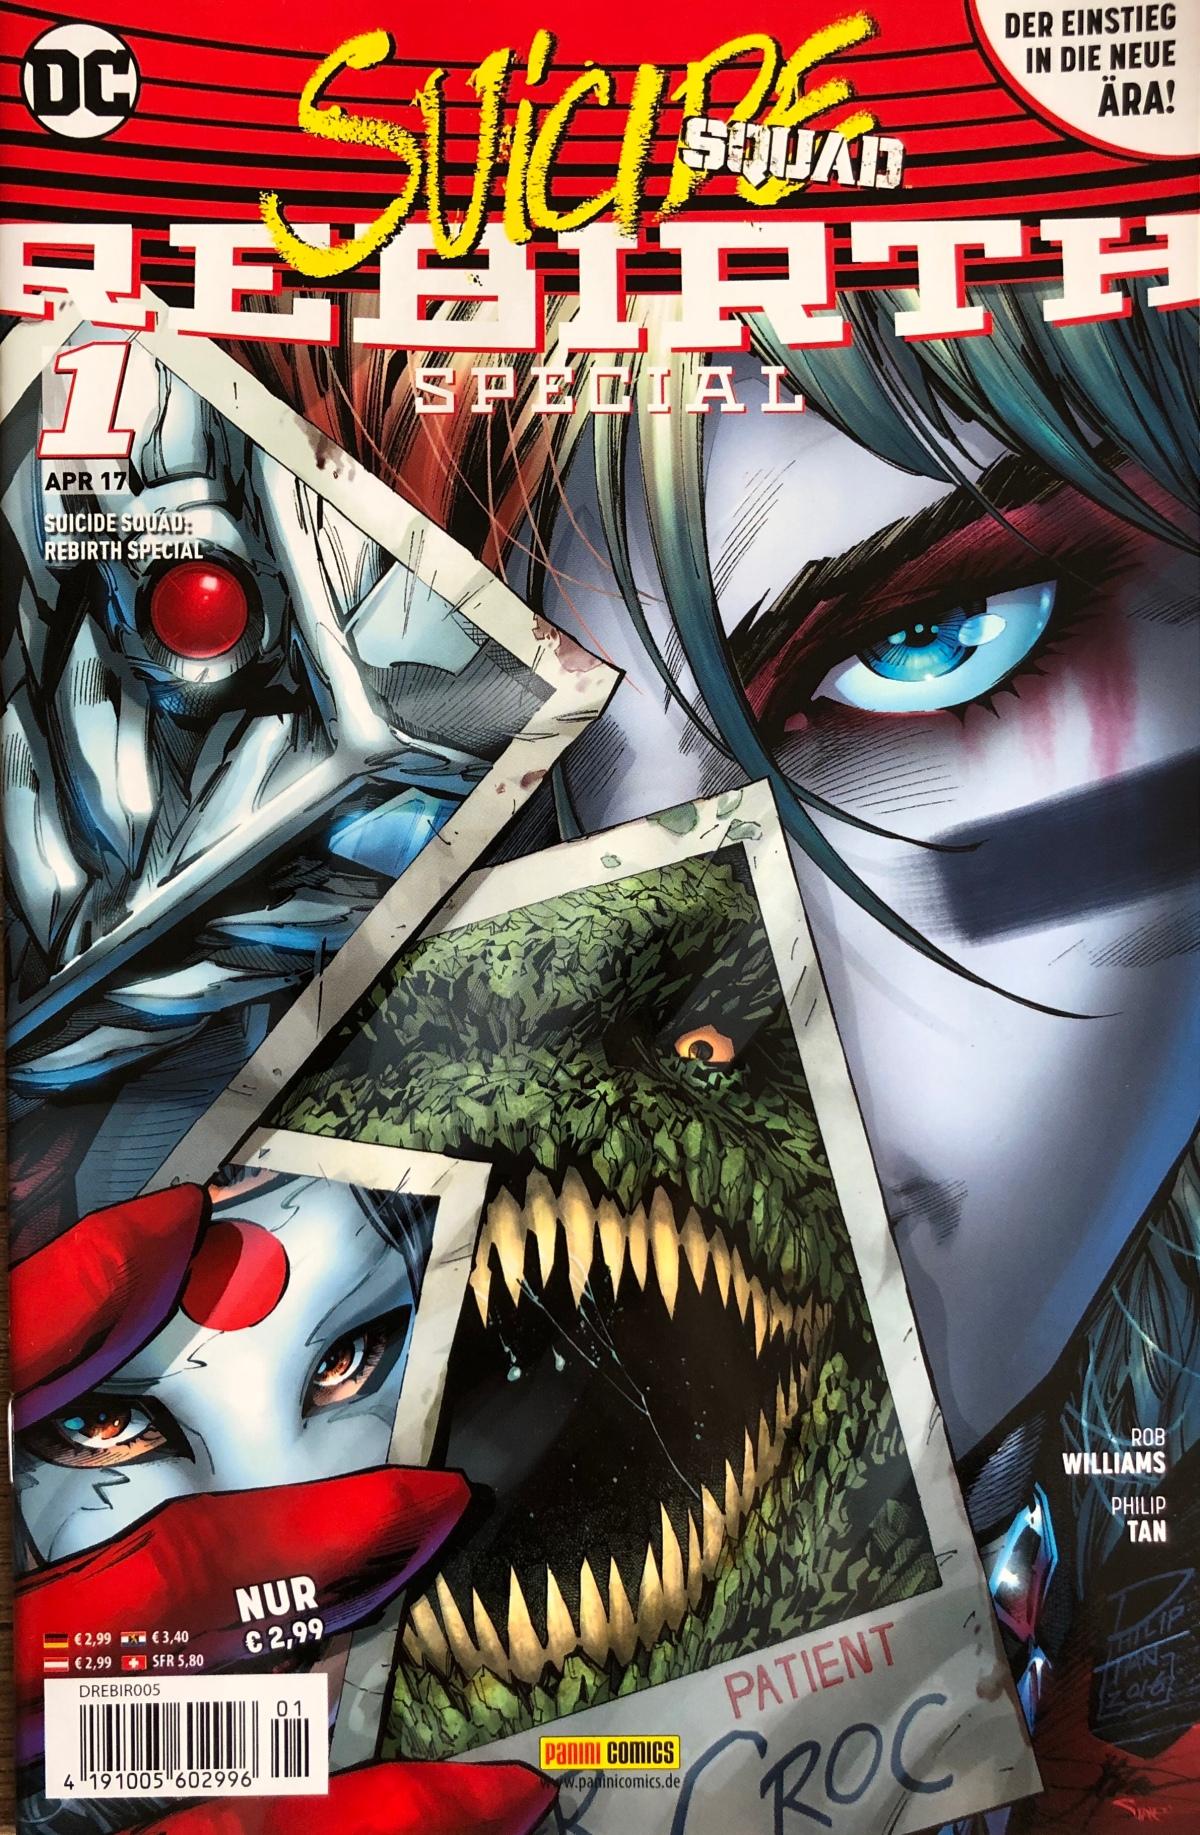 Suicide Squad Rebirth Special |Review